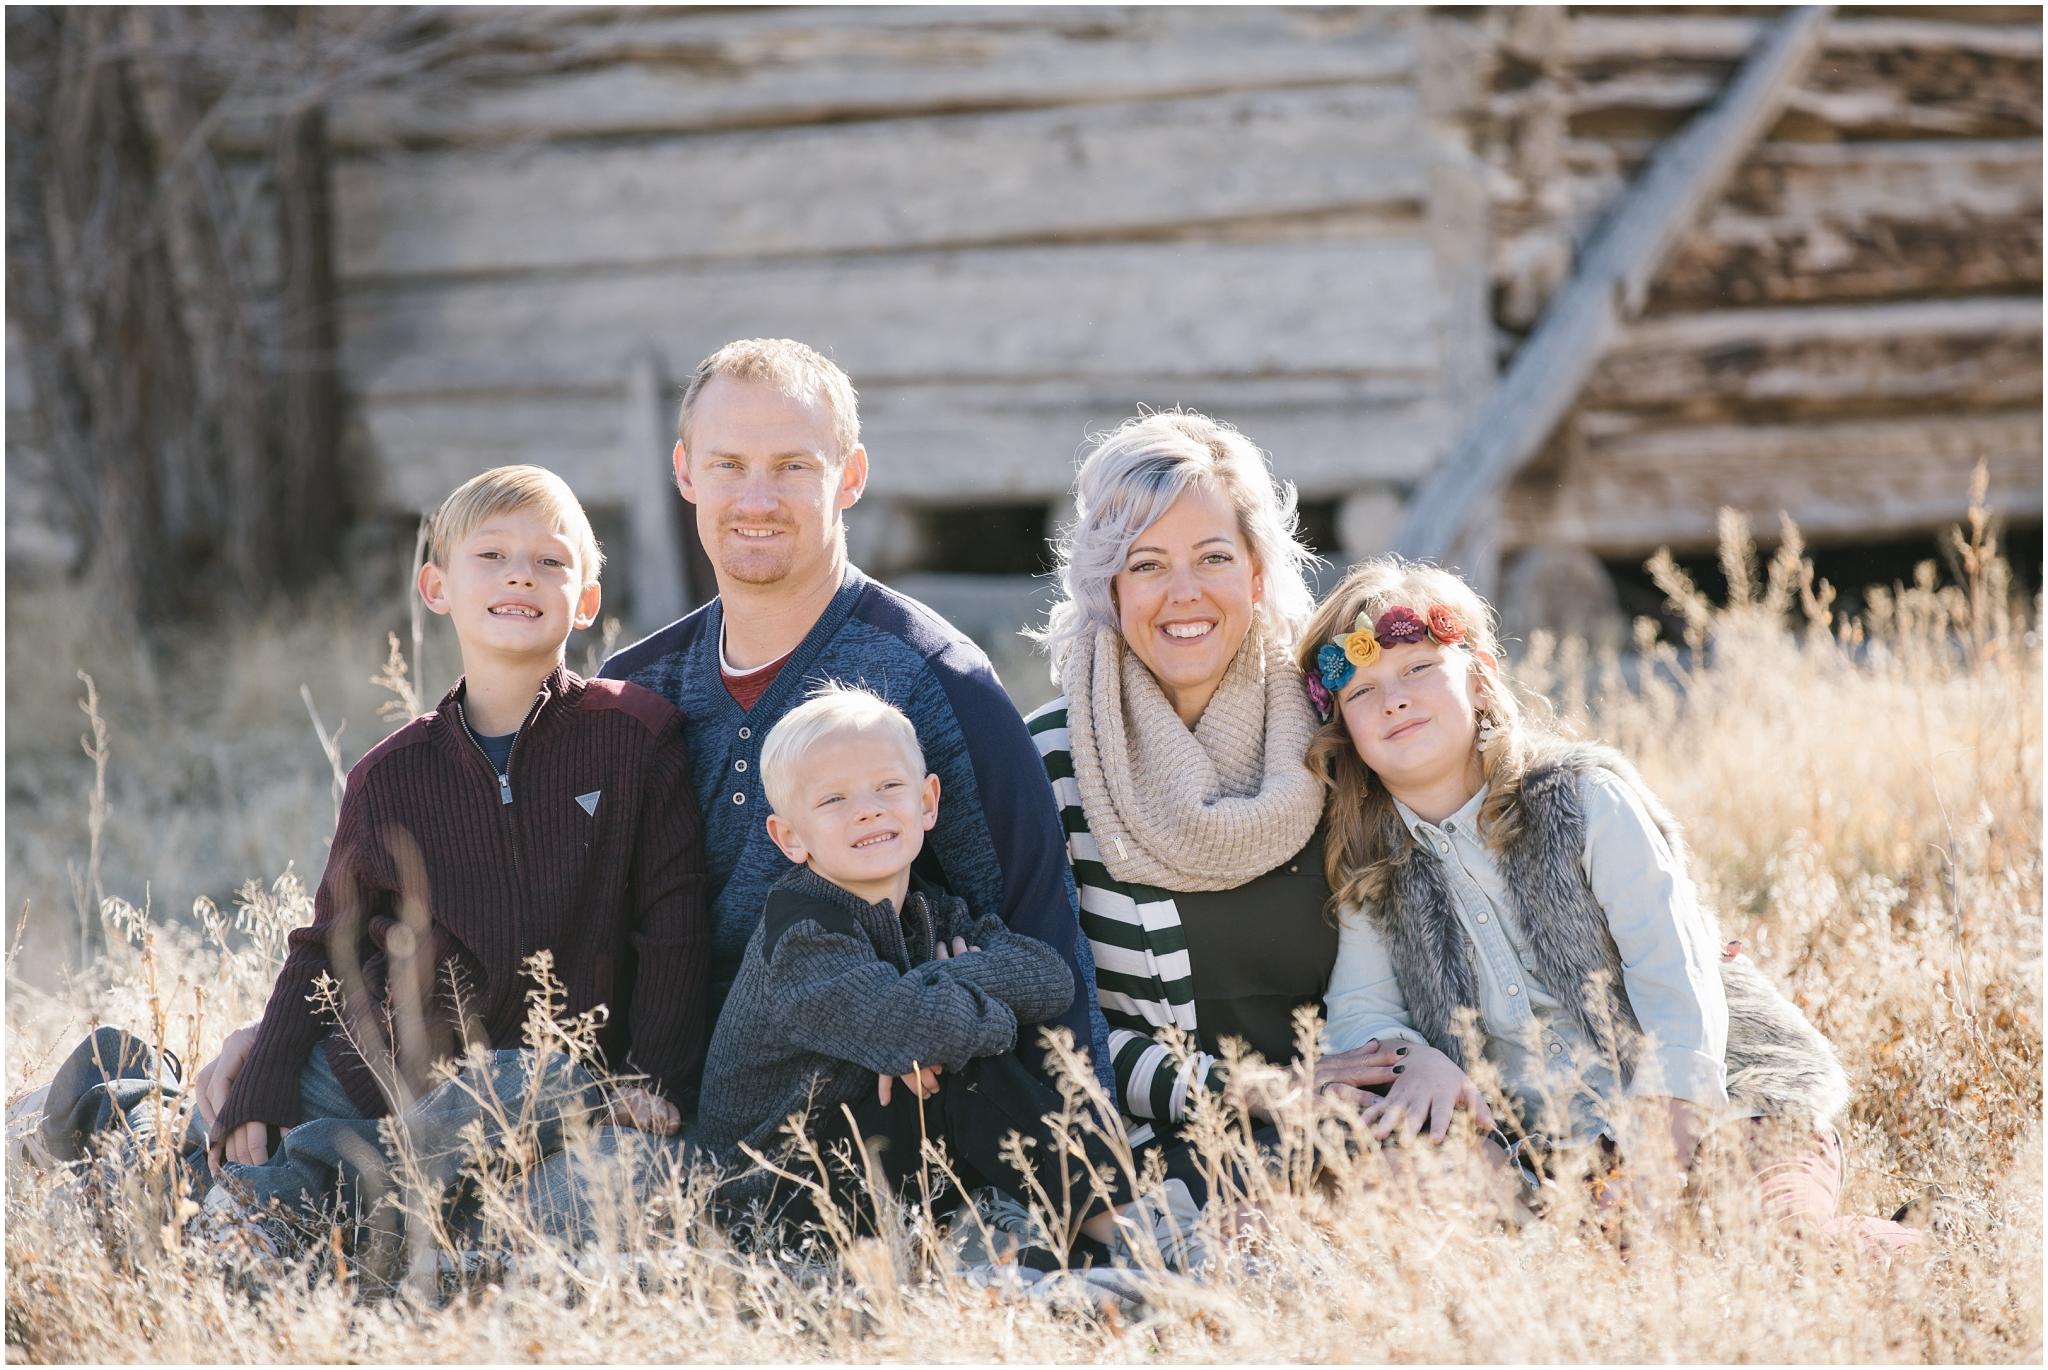 Laws-109_Lizzie-B-Imagery-Utah-Family-Photographer-Salt-Lake-City-Park-City-Davis-County-Clearfield.jpg